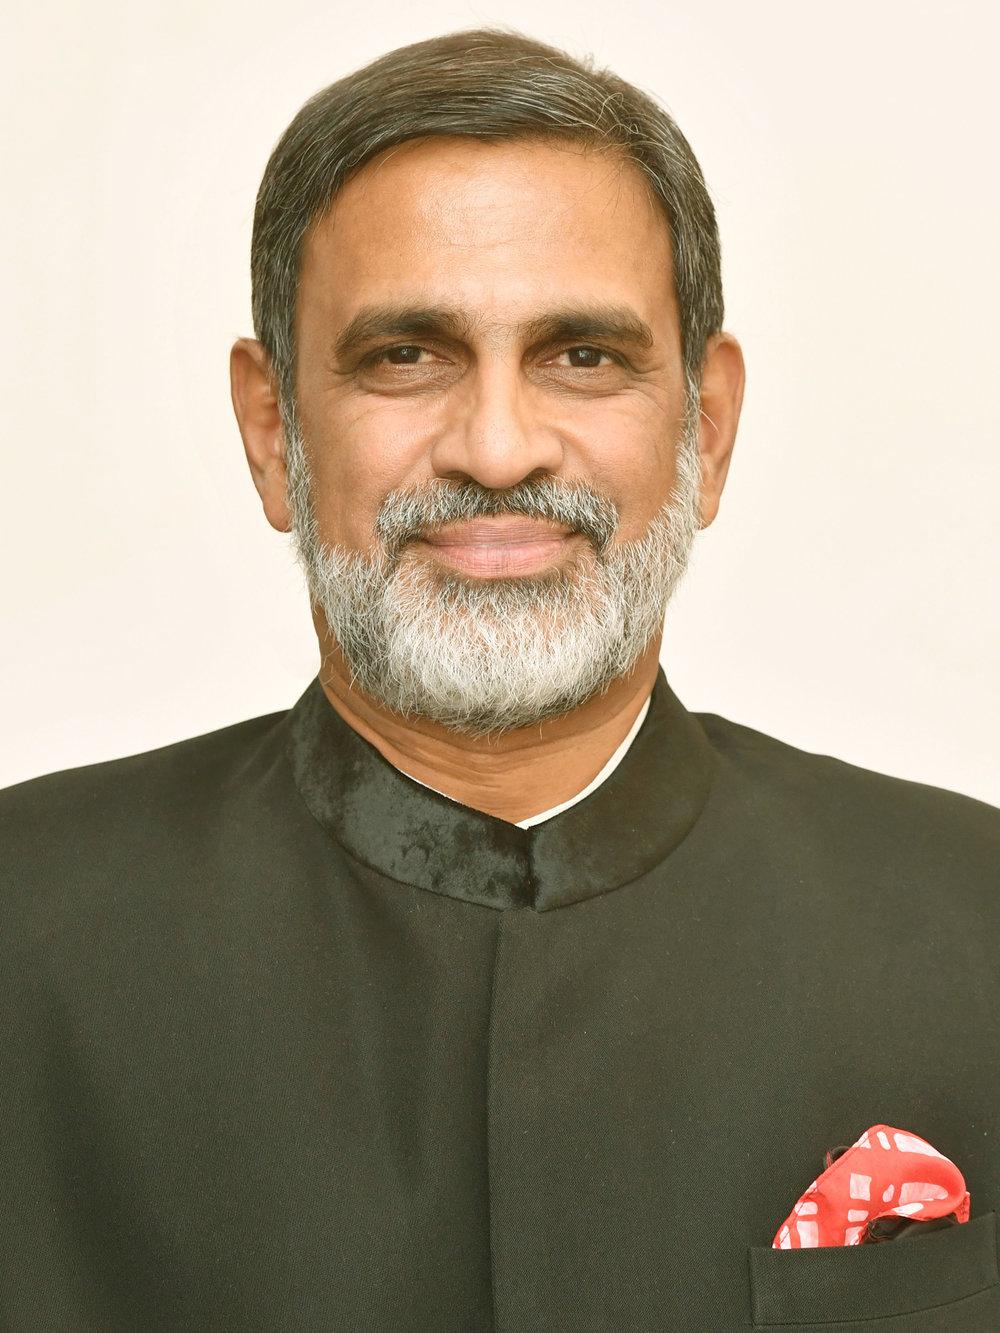 Ambassadeur Venu Rajamony (foto: Indian Embassy)